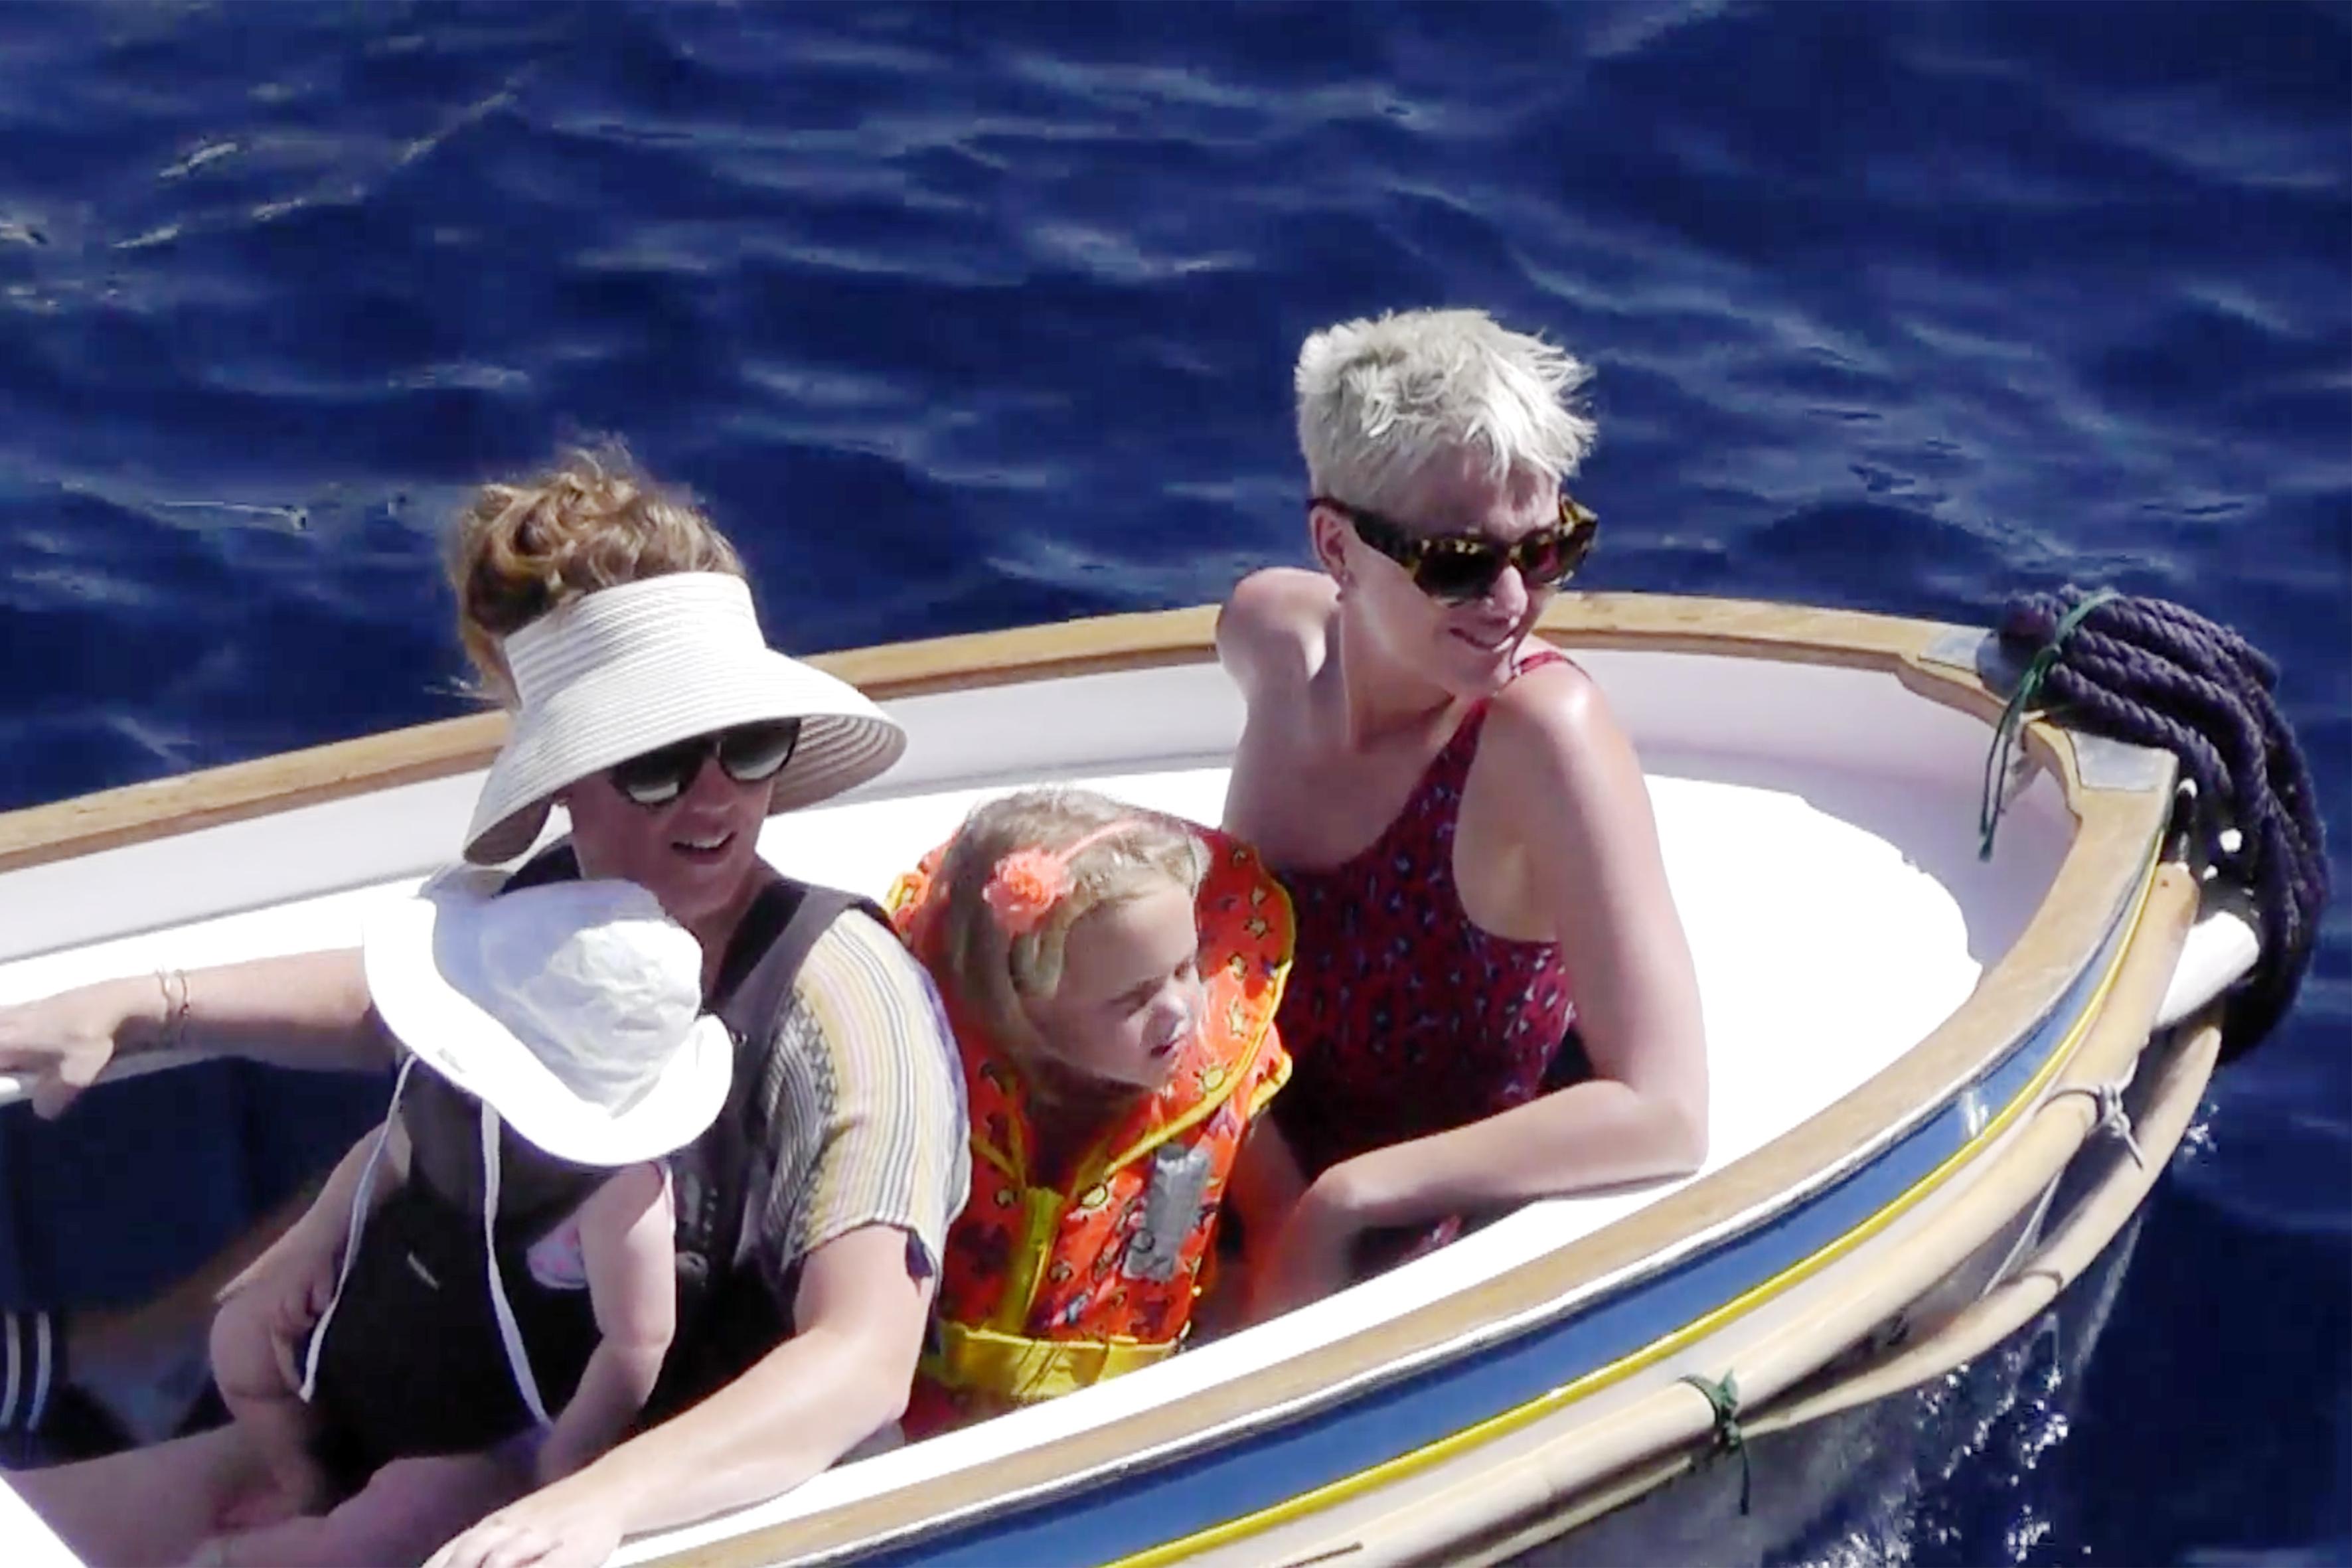 katy perry, kendte, båd